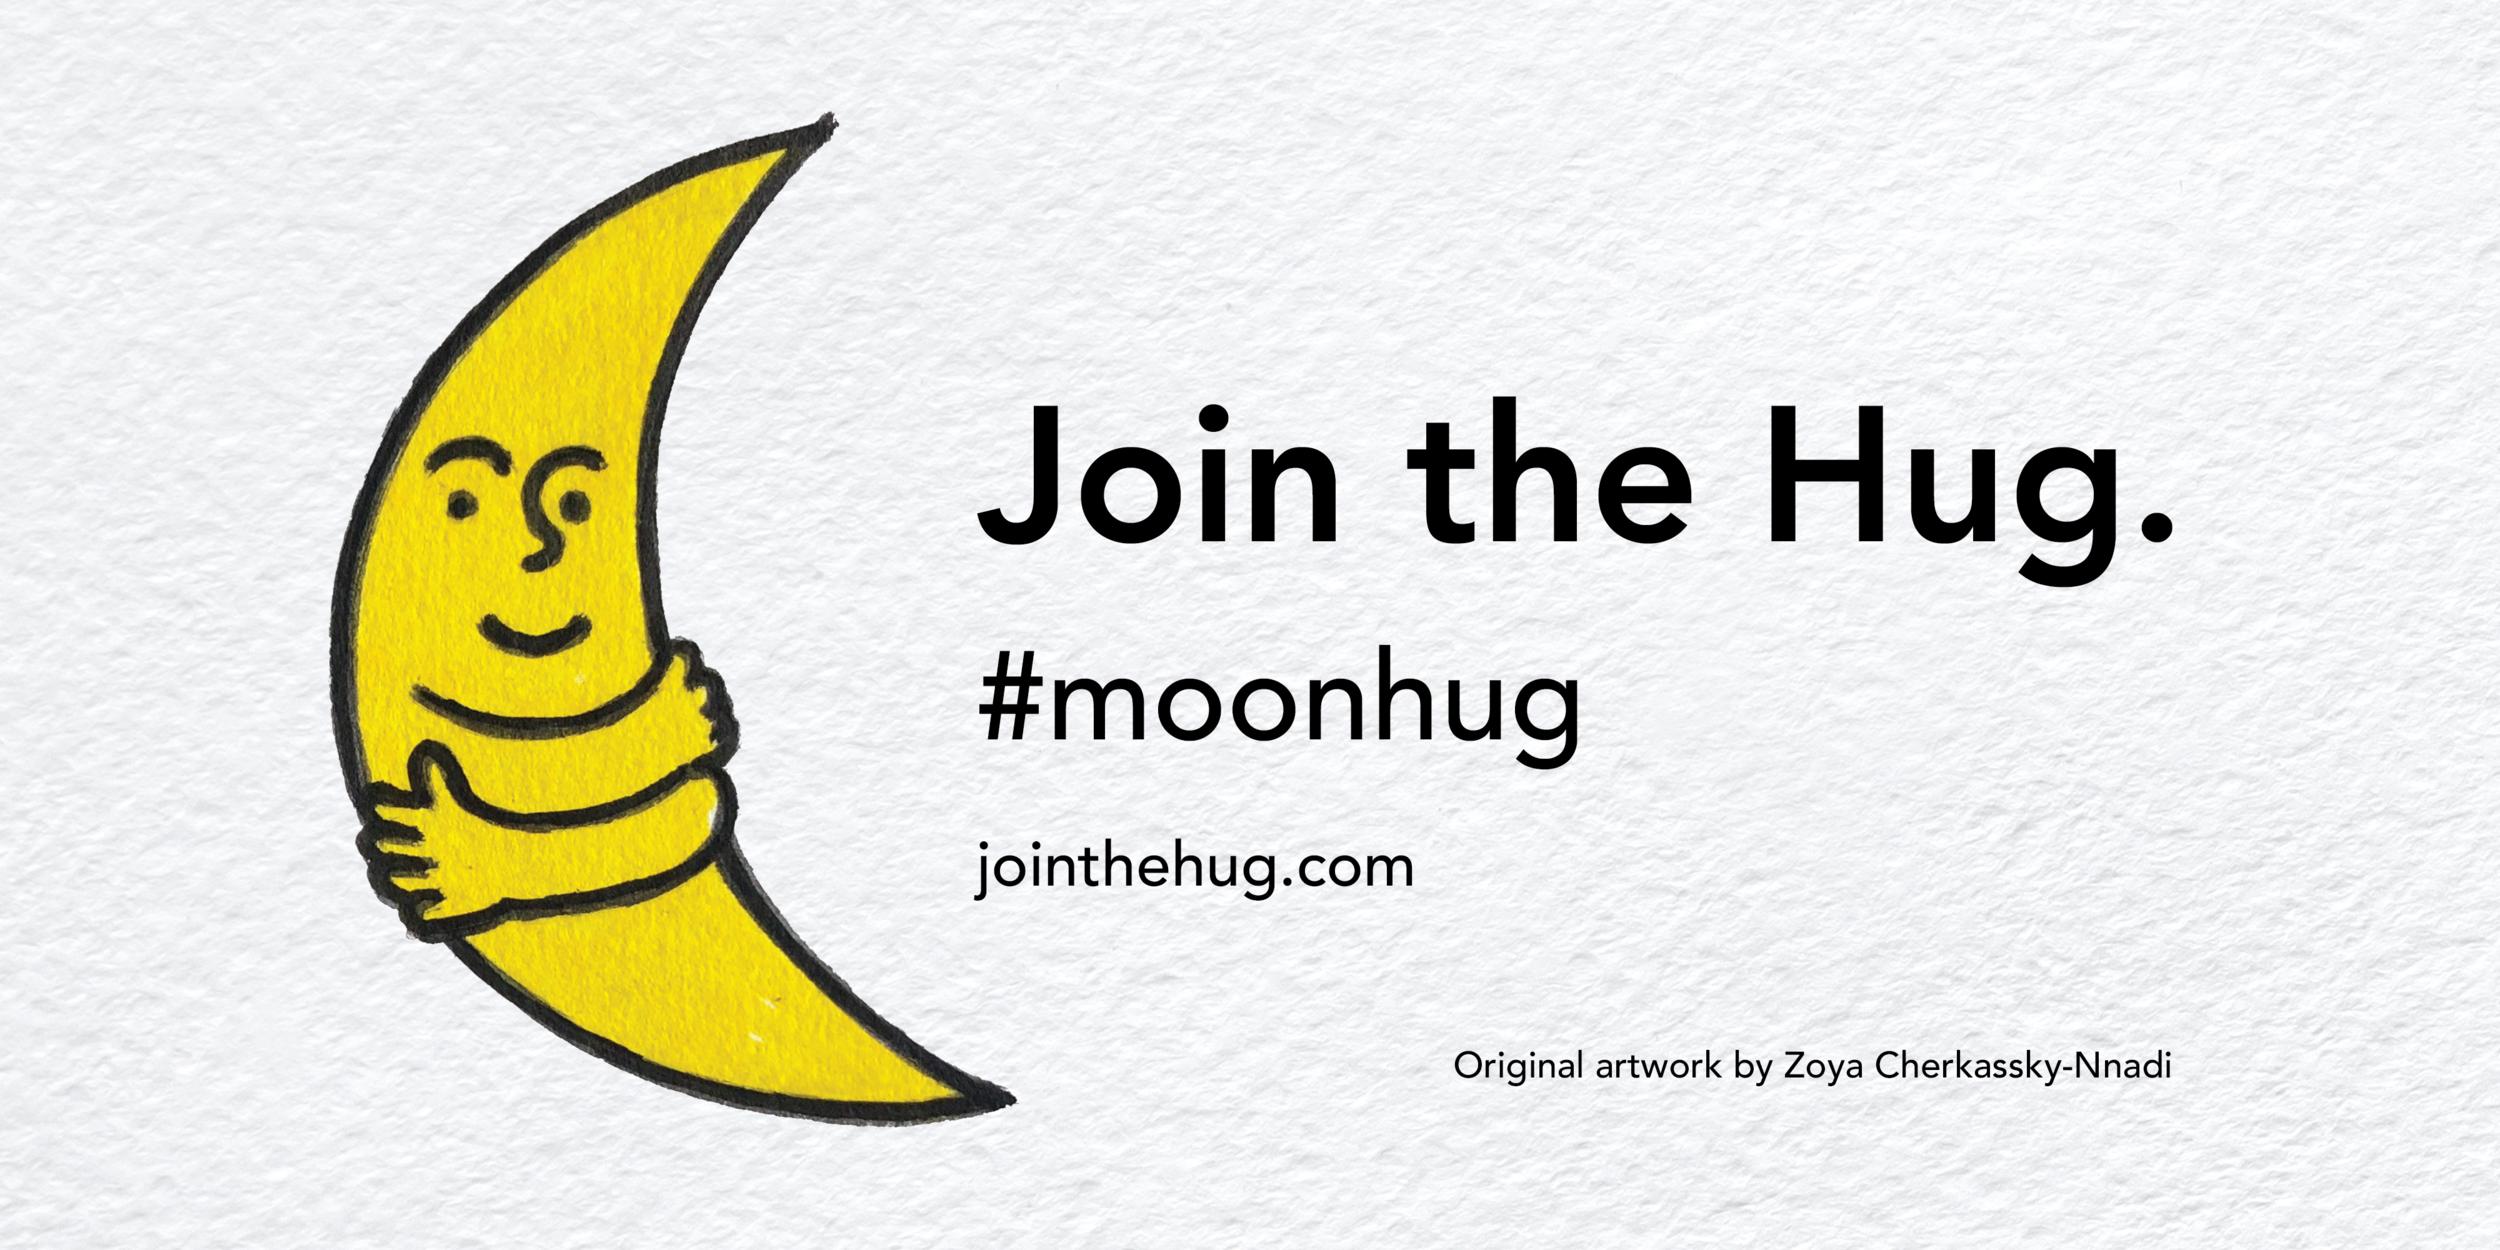 MoonHug_Social_Hashtag_2.png